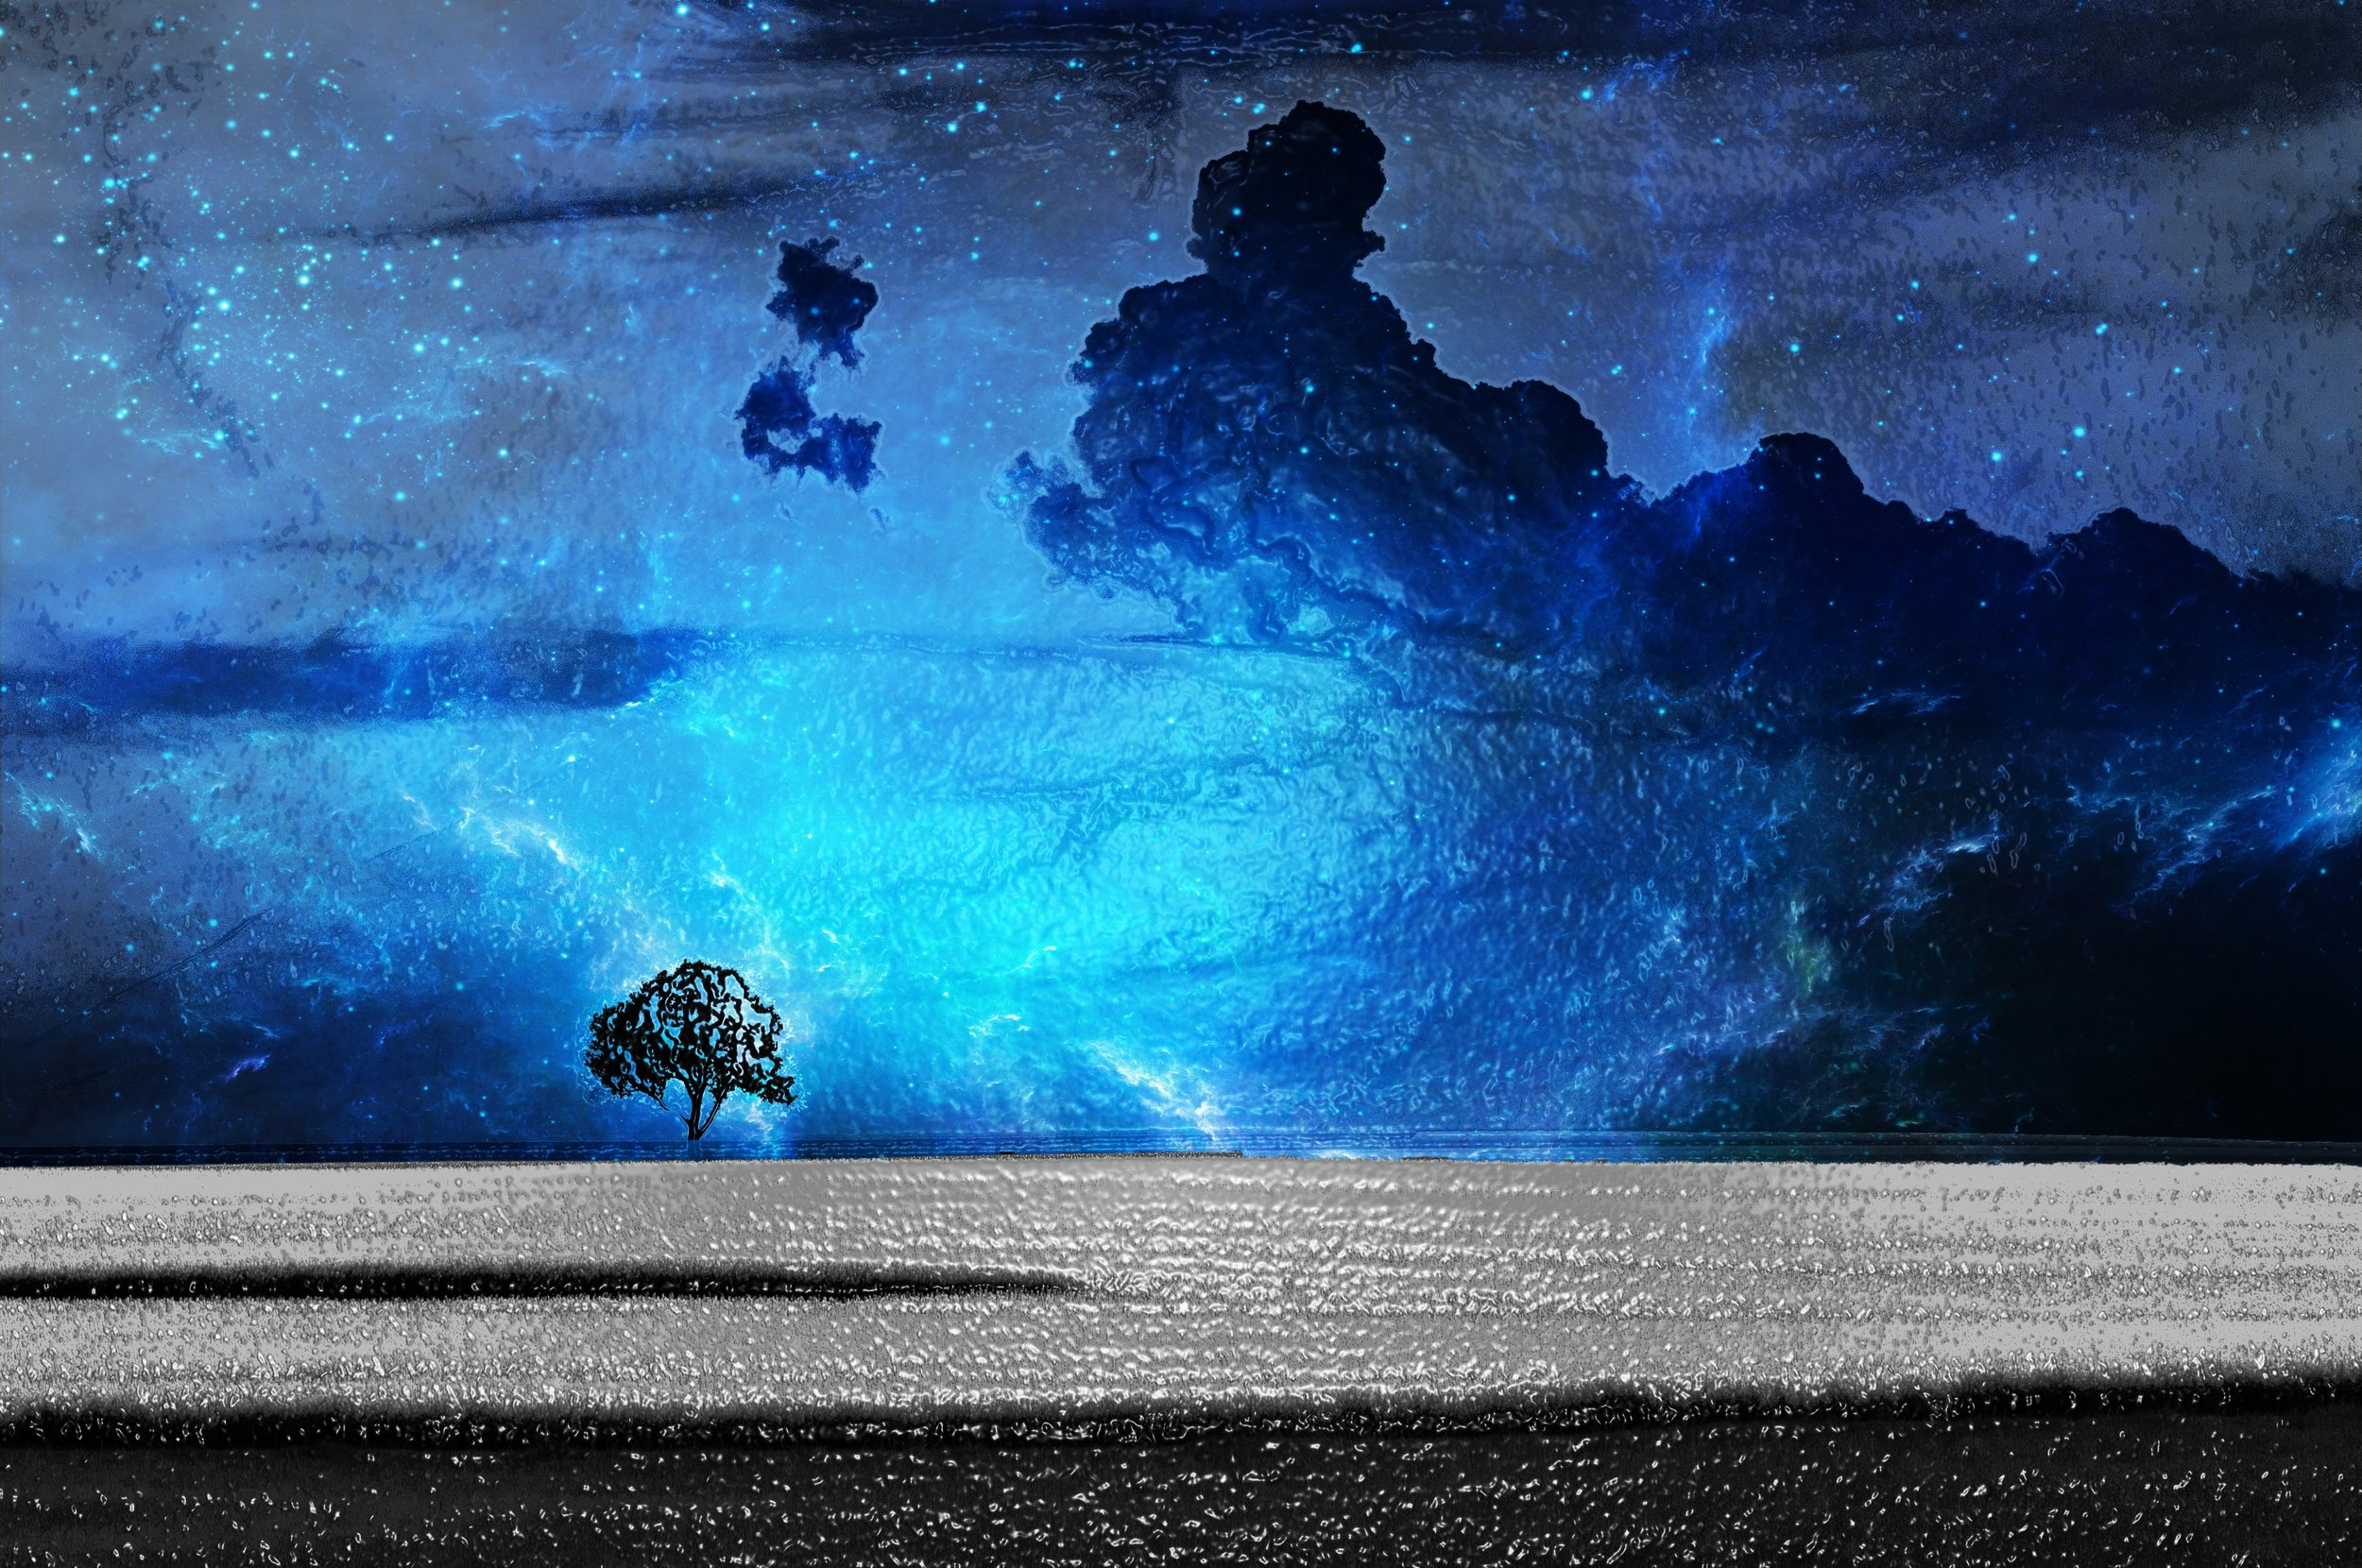 dreaming in negatives (color).jpg